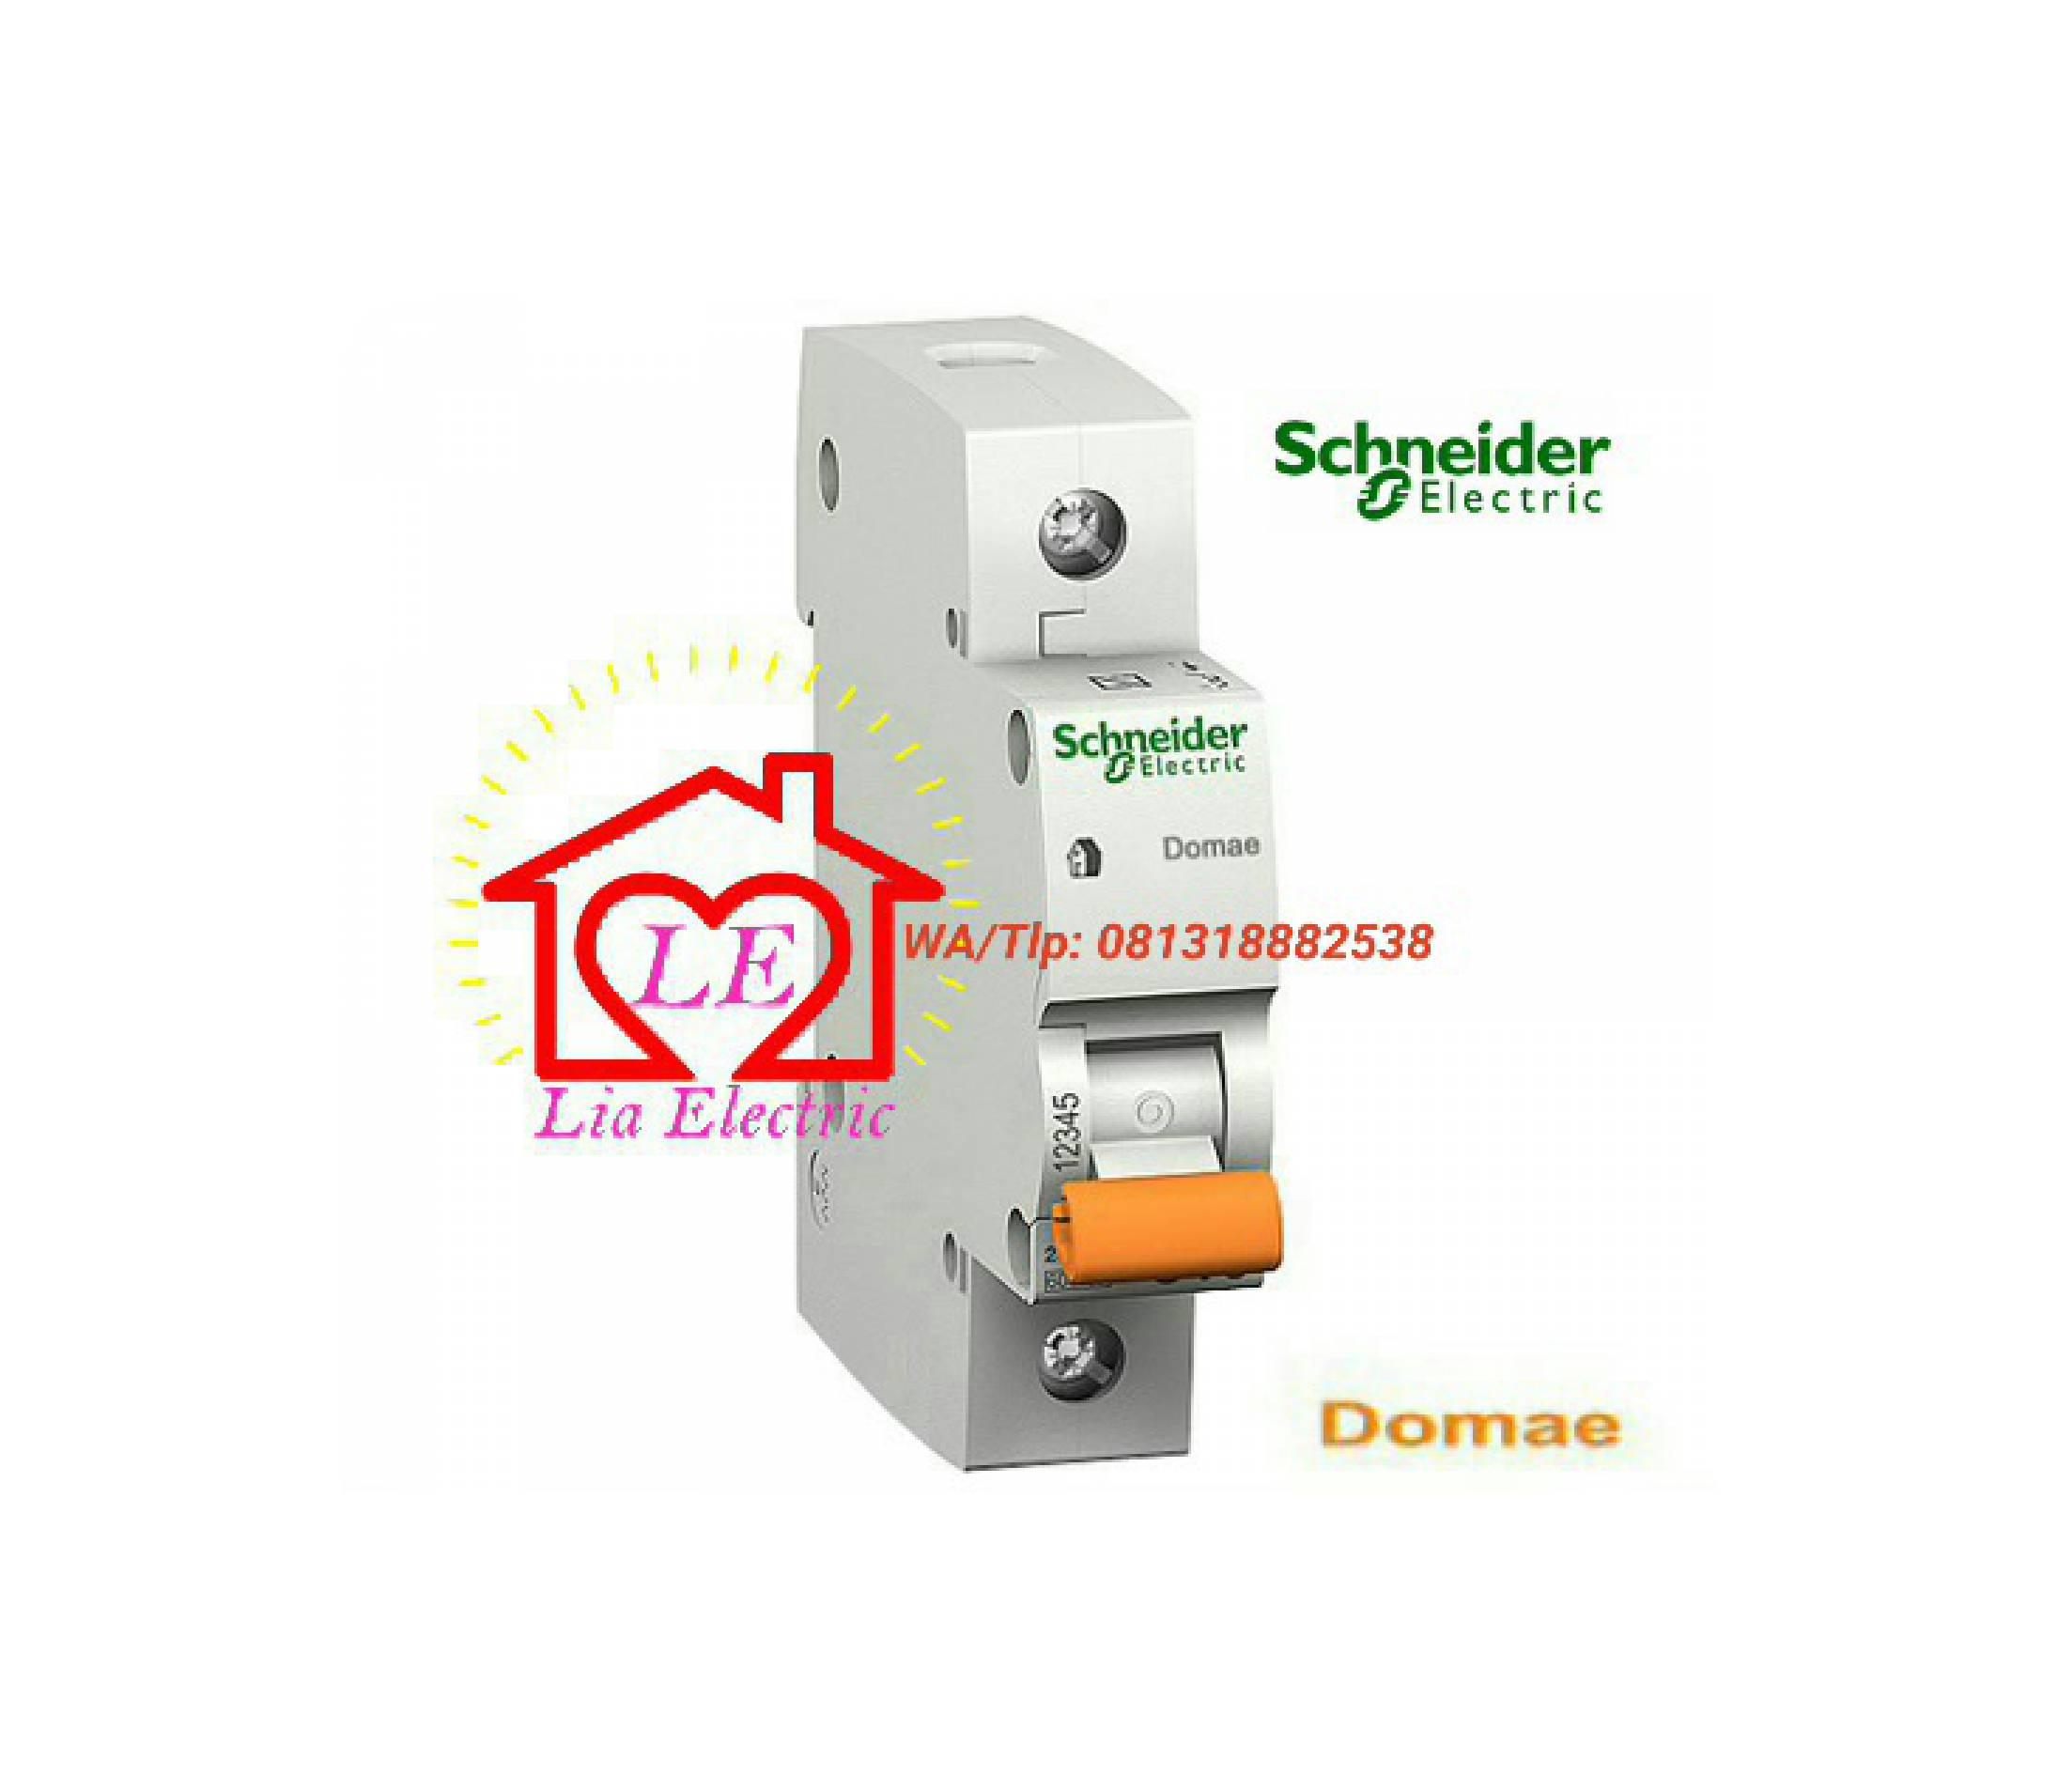 Mcb Schneider Electric 10a 1phase Domae Berkualitas Best Buy Indonesia Rcbo Slim 1p N 2a Dom12251sni Schneideridr83800 Rp 83800